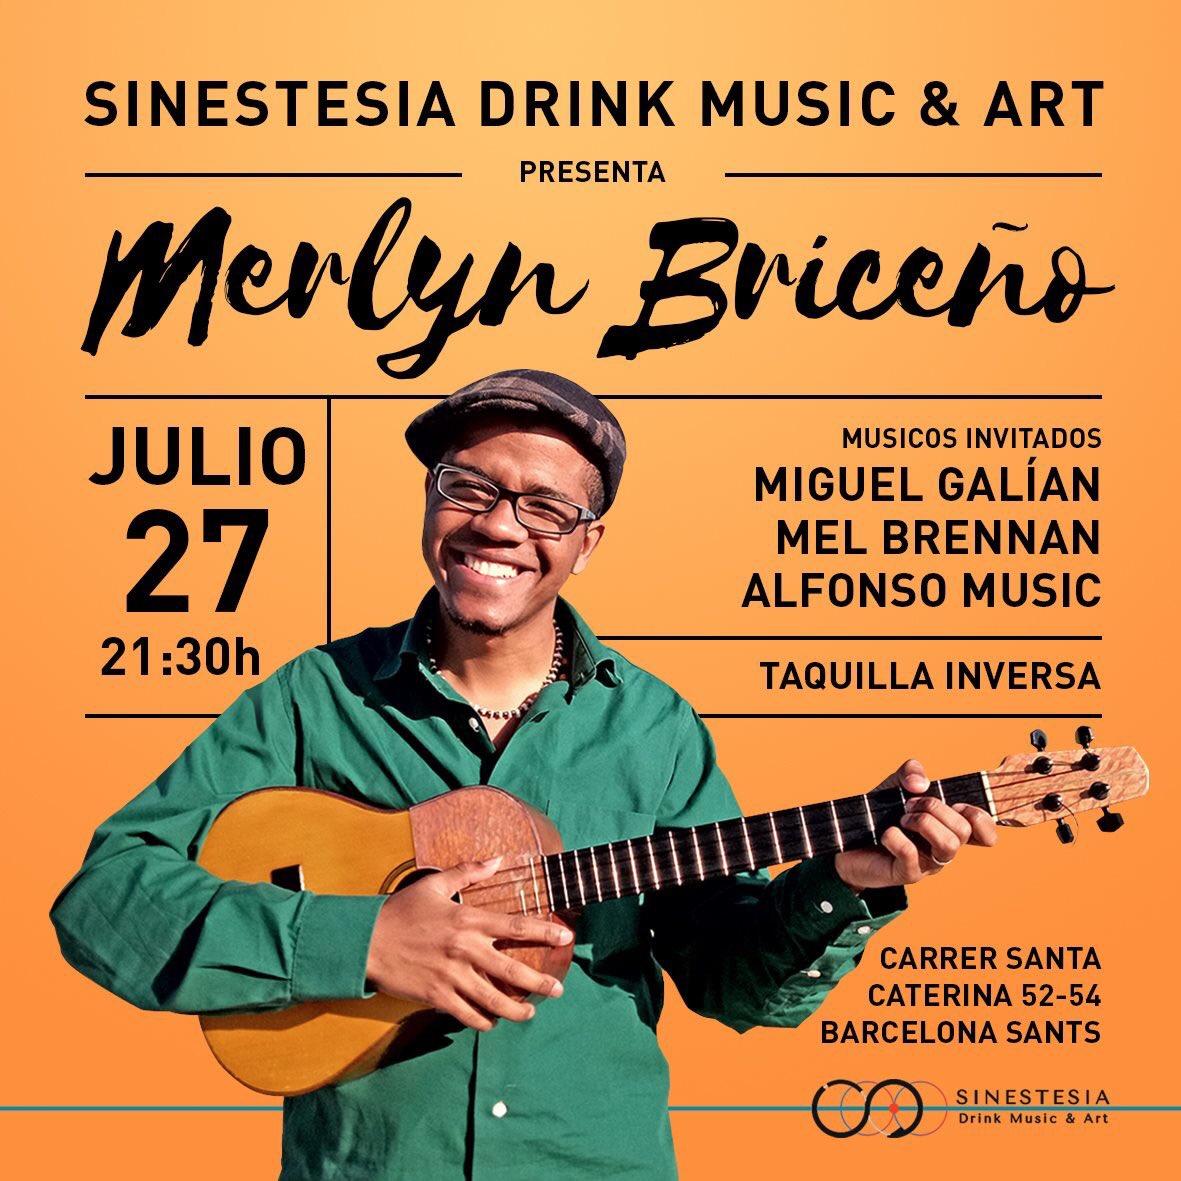 SÁBADO 27/07 - 22 h - MERLYN BRICEÑO EN CONCIERTO Y ARTISTAS INVITADOS https://sinestesia.barcelona/event/merlyn-briceno-3/… #CuatroVenezolano #Sinestesia #DrinkMusicArt #Barcelona #musica #arte #livemusic #night #live #Sants #SantsEstació #PlaçaDelCentre #PlaçaDeSants